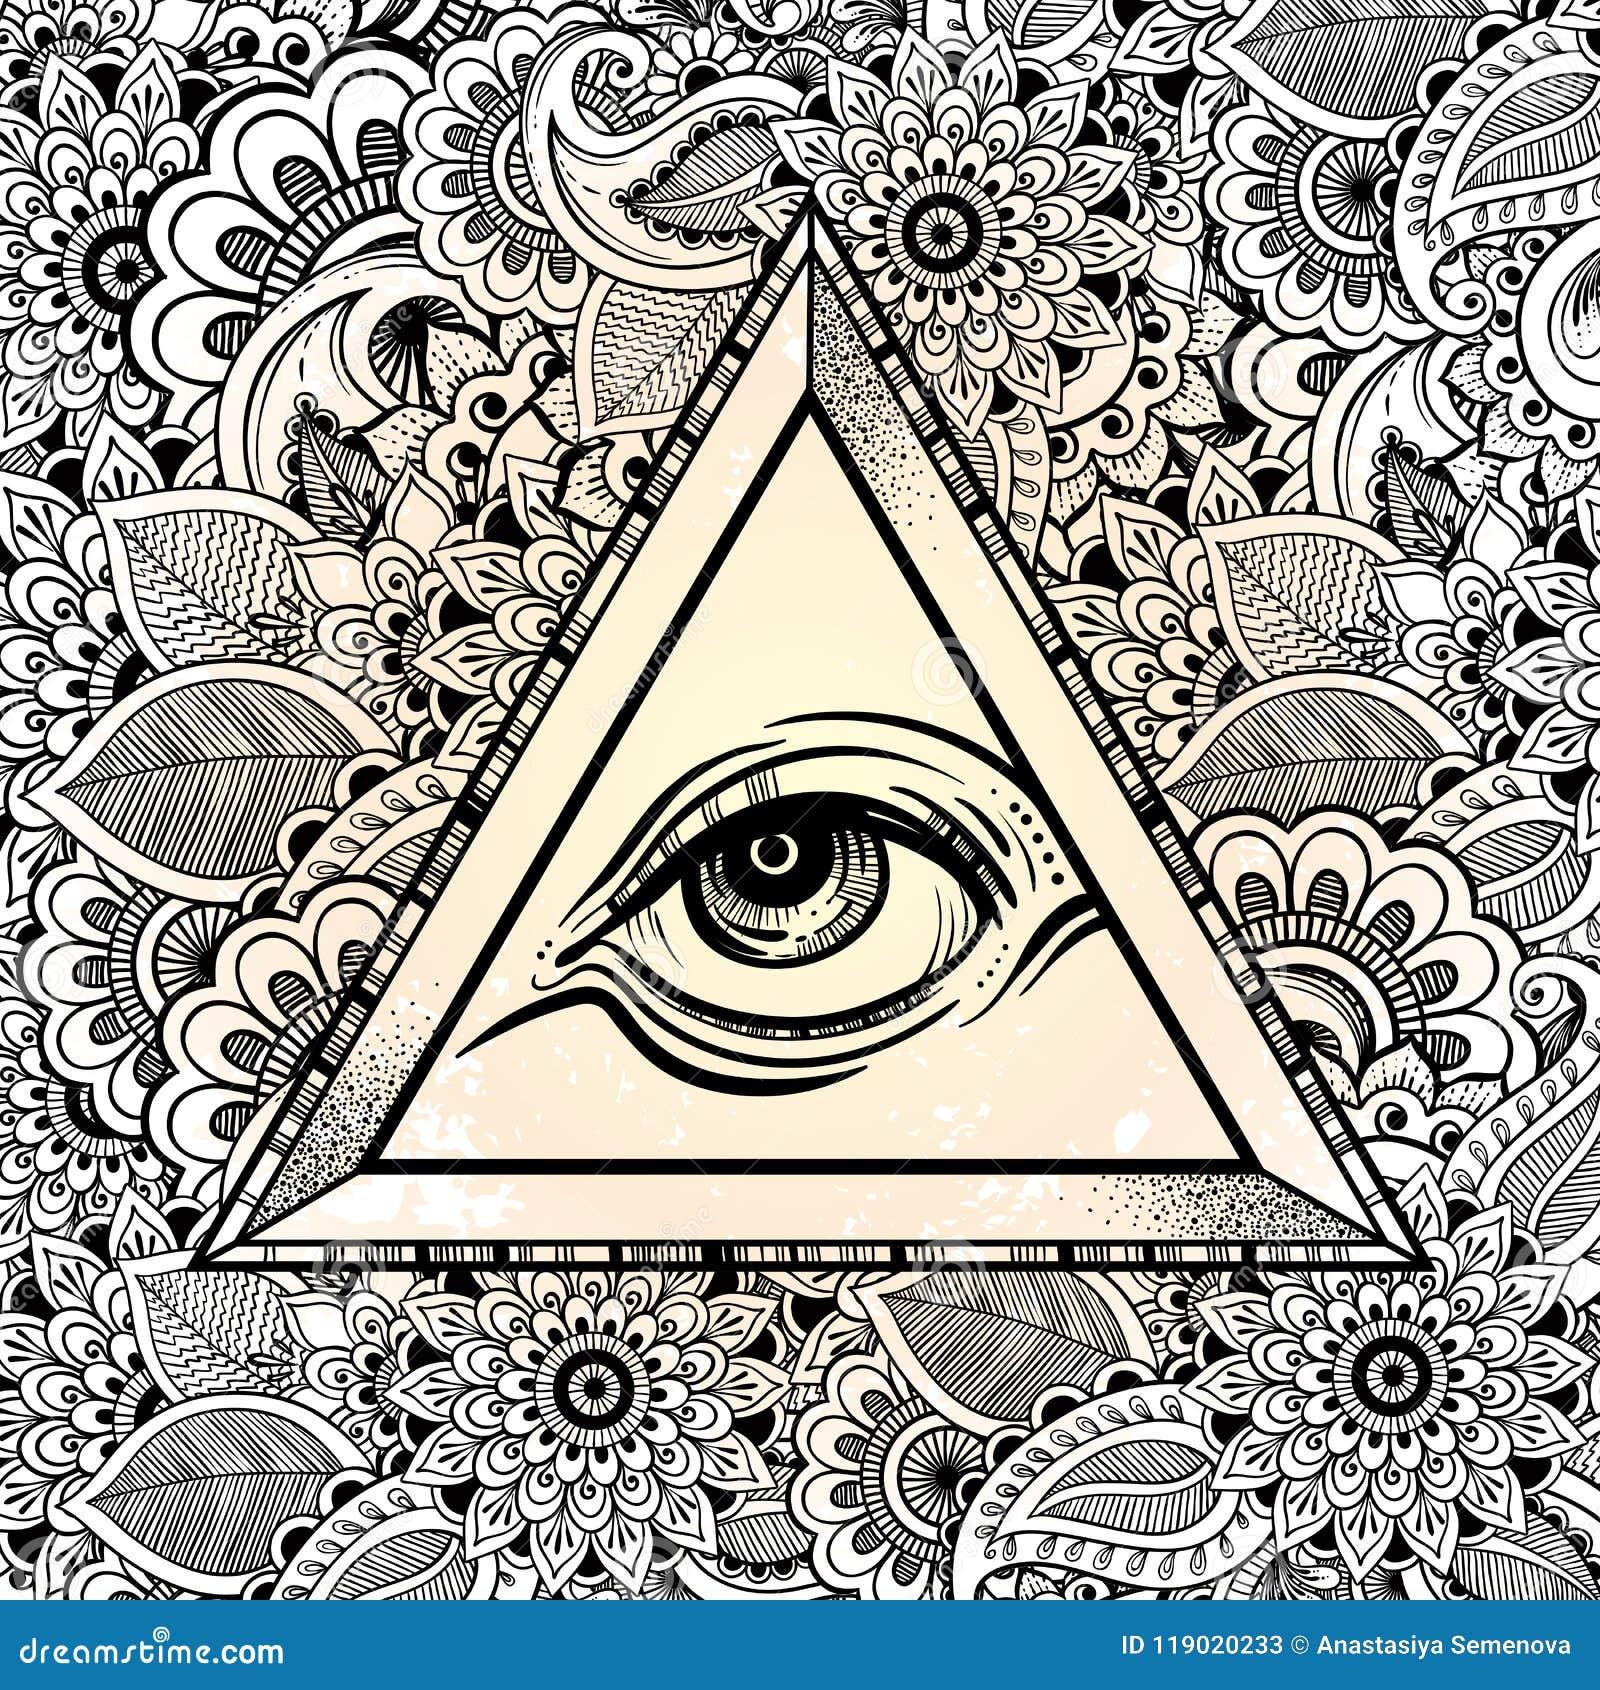 d9593b56c3b79 All seeing eye pyramid symbol. Hand-drawn Eye of Providence. Alchemy,  religion, spirituality, tattoo art. Vector illustration.